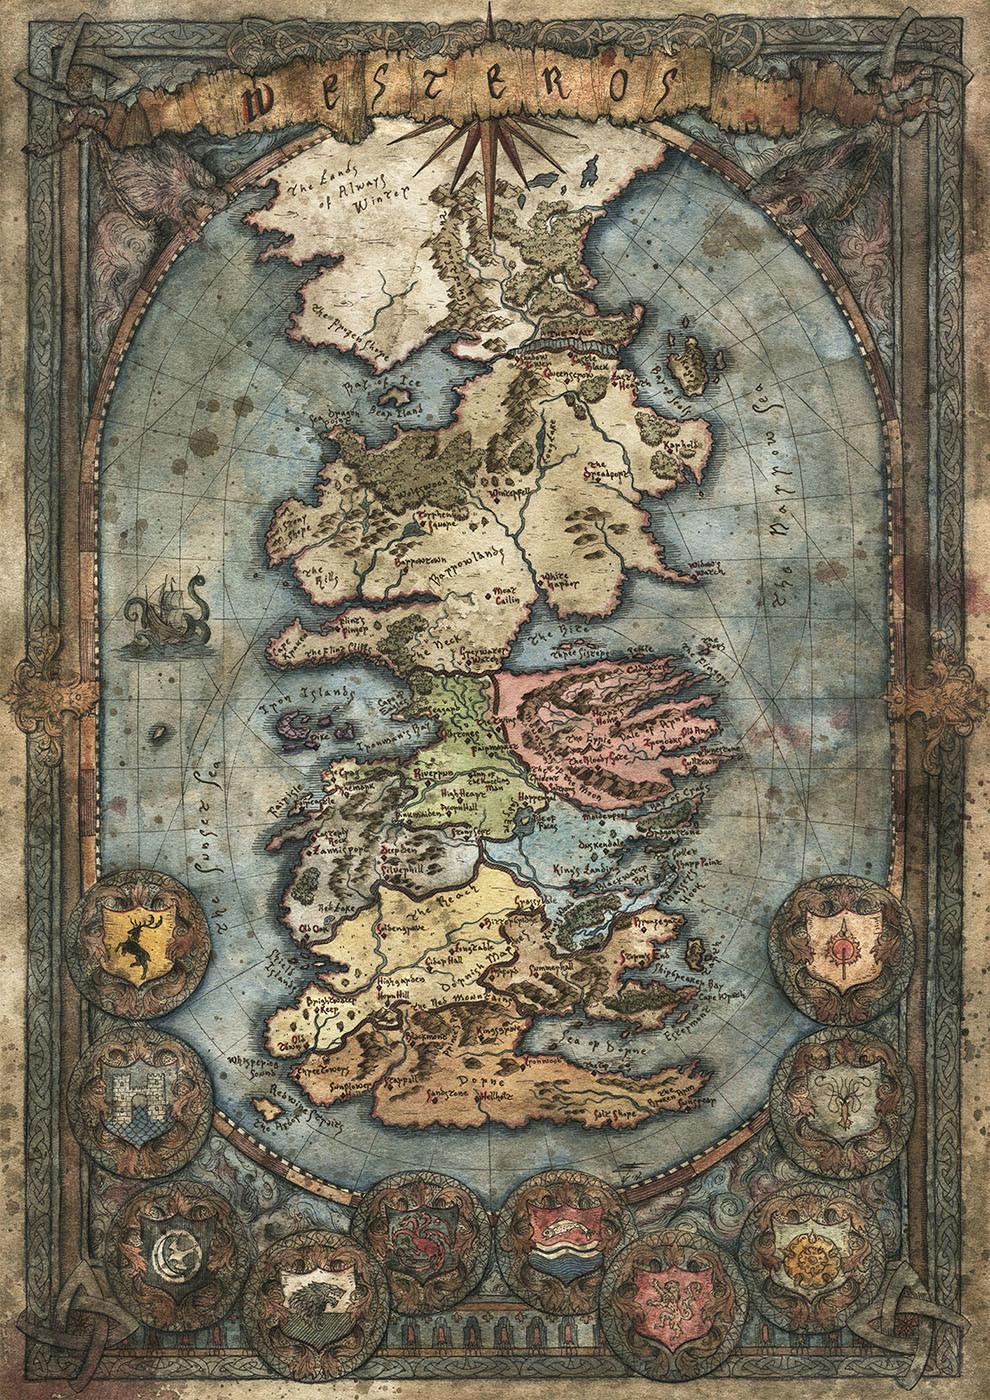 Map by Francesca Baerald